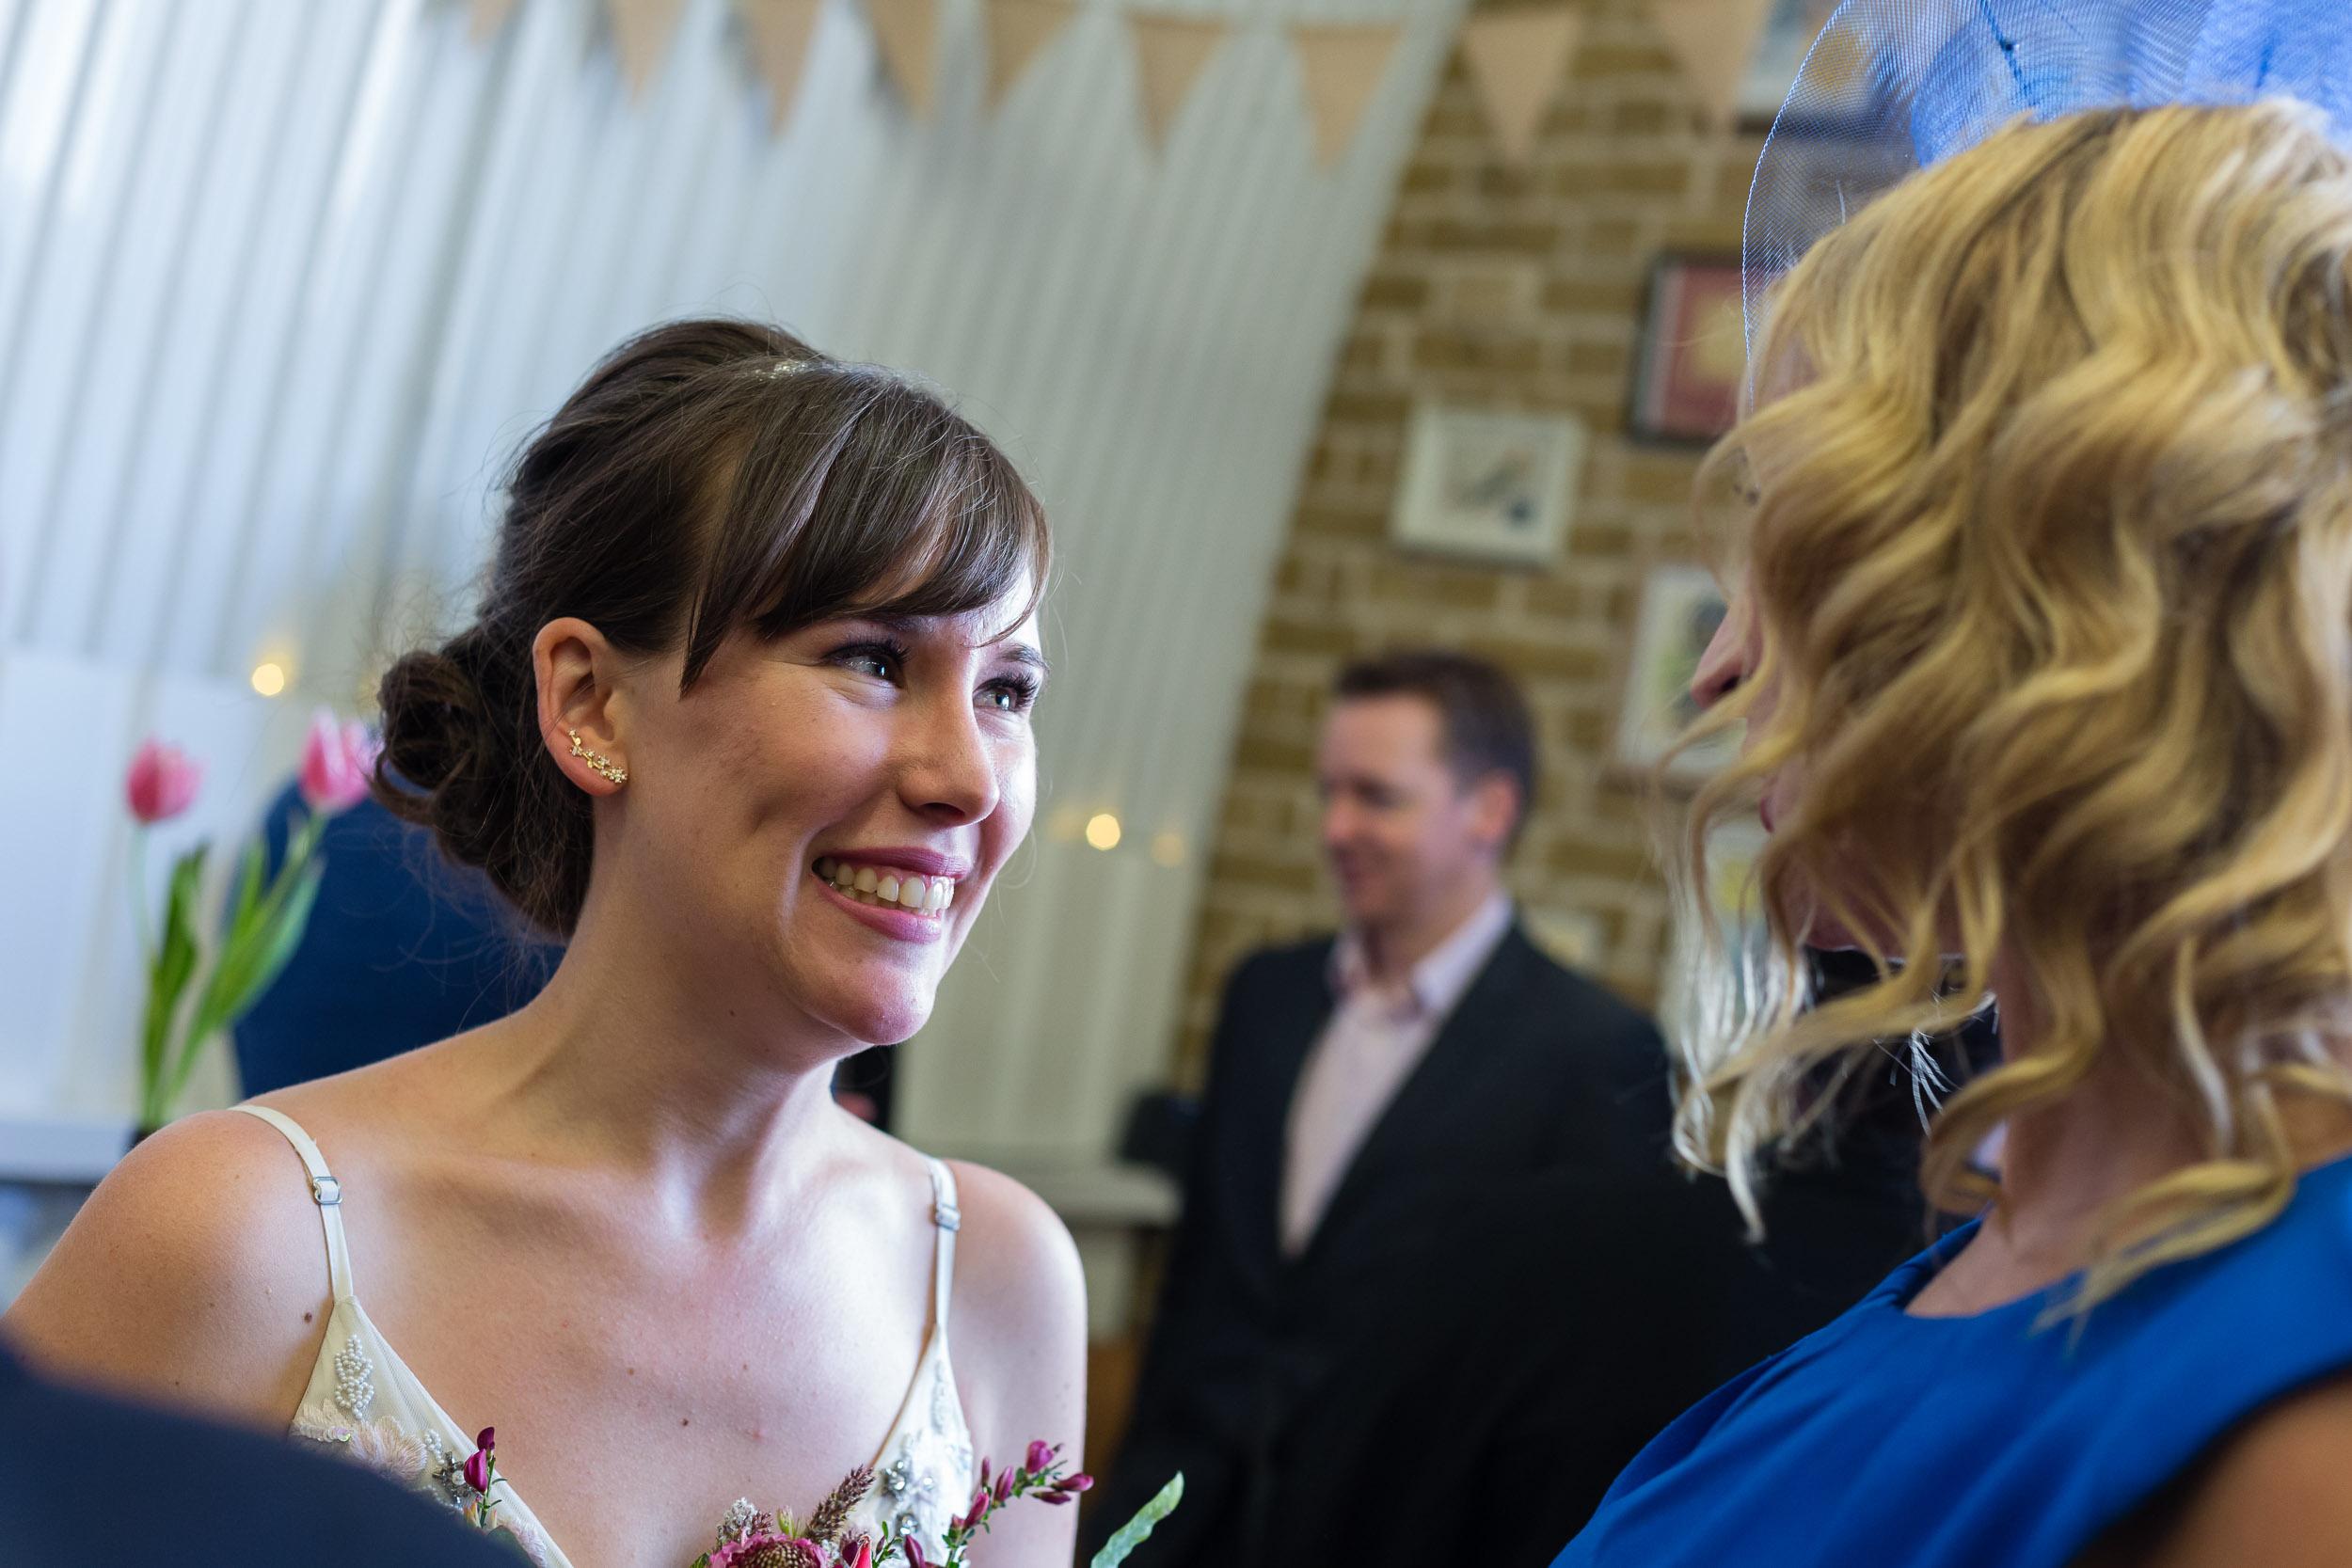 brockwell-lido-brixton-herne-hill-wedding-075.jpg